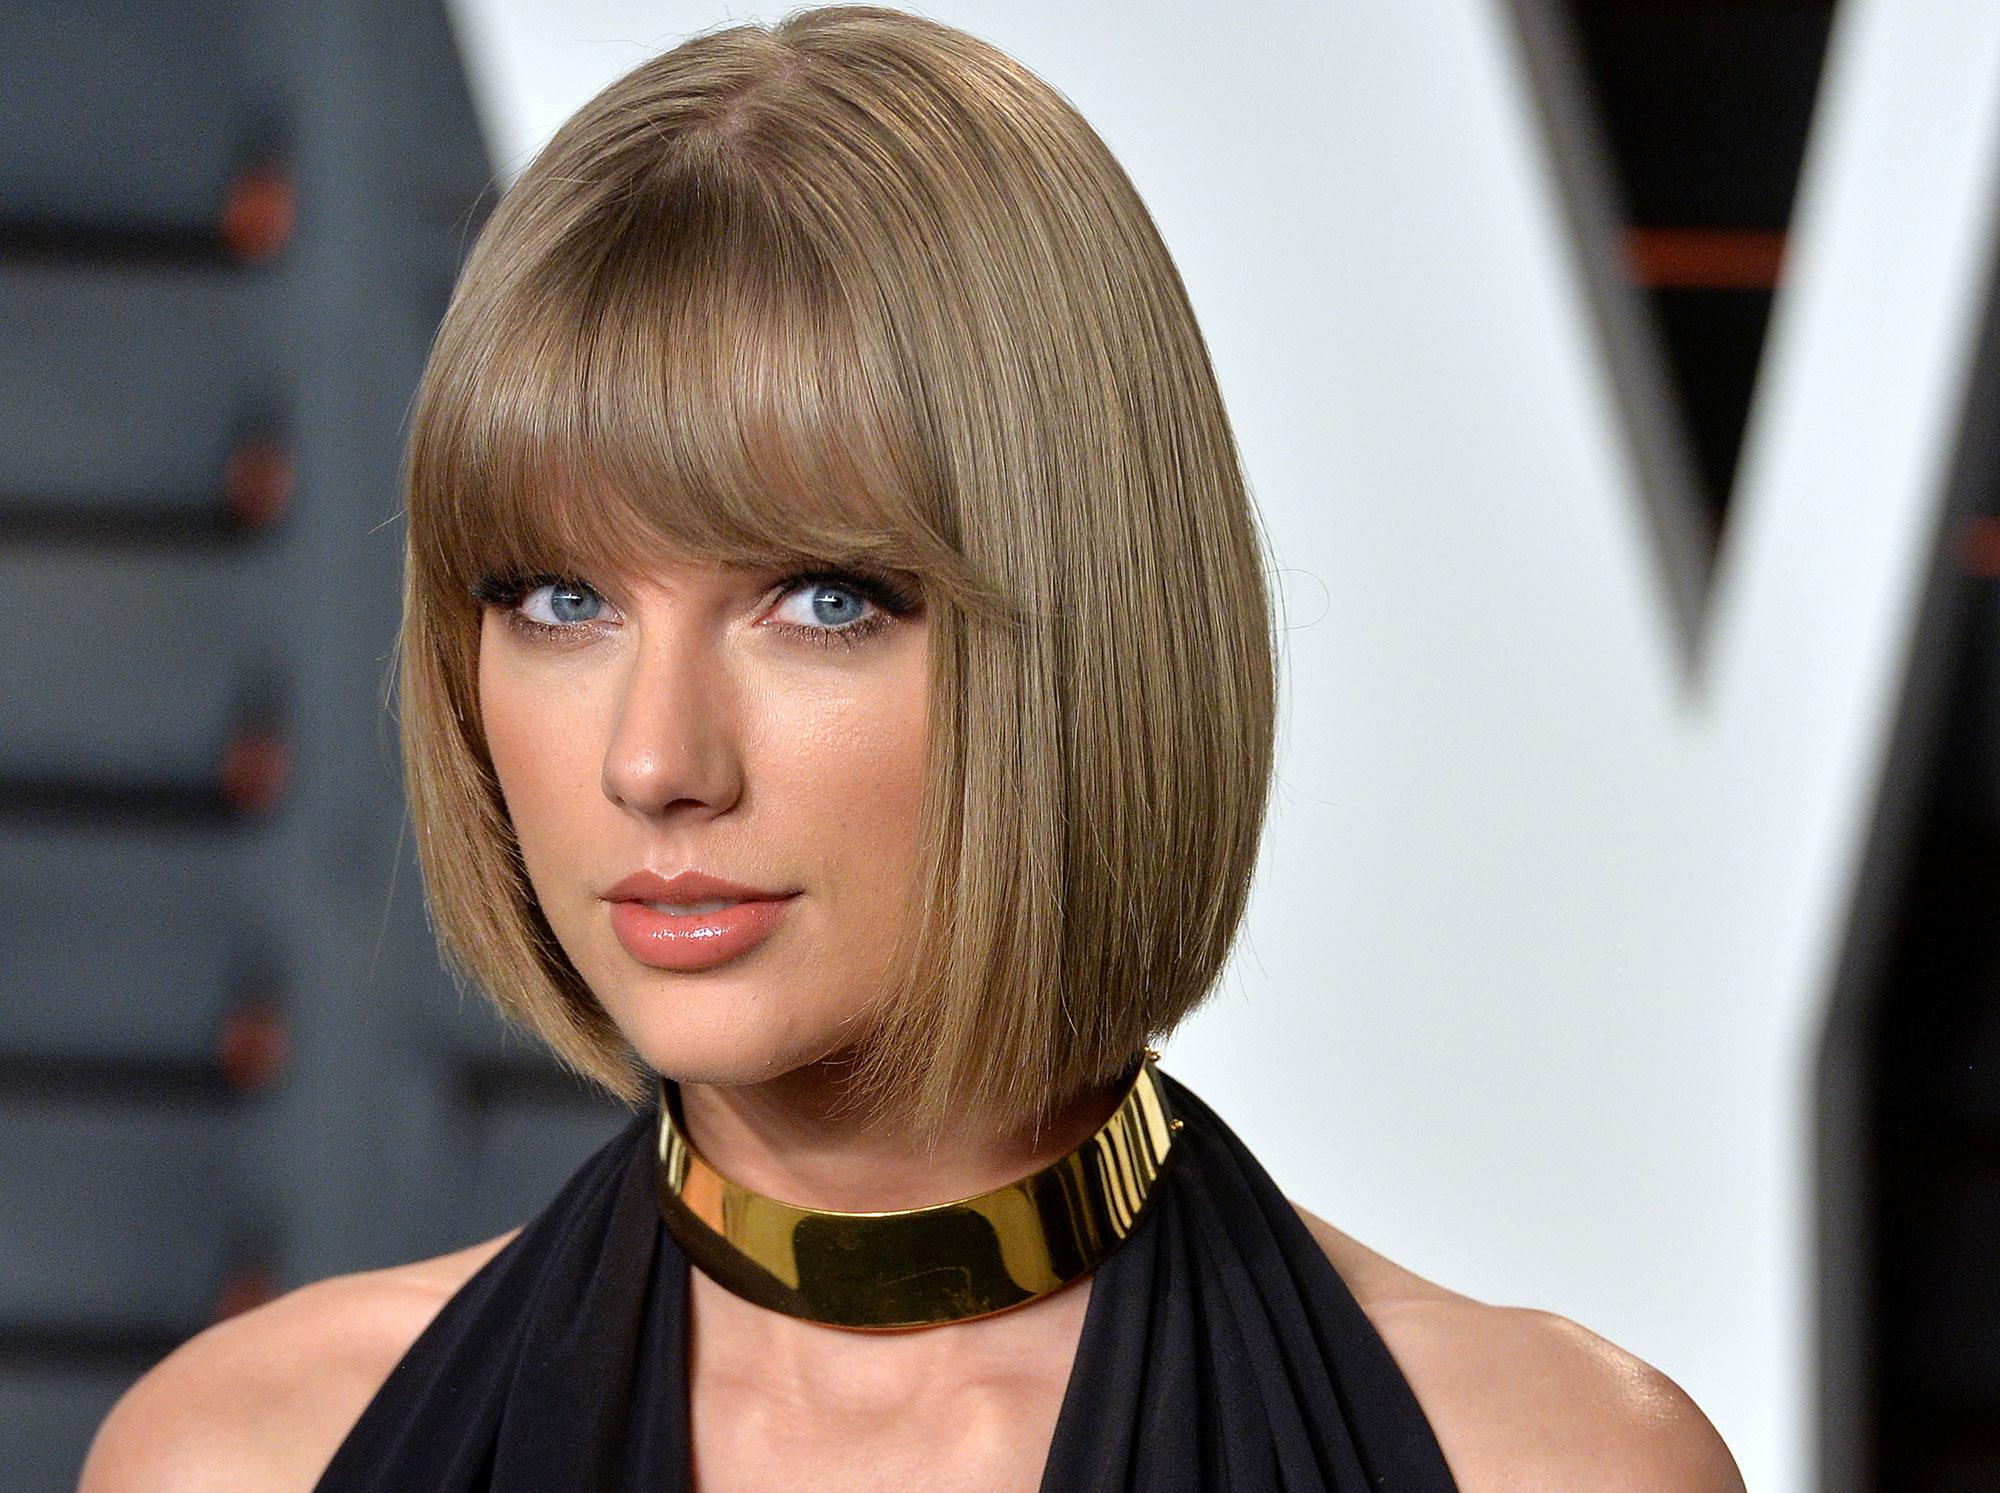 Eddie Redmayne has denied dating Taylor Swift